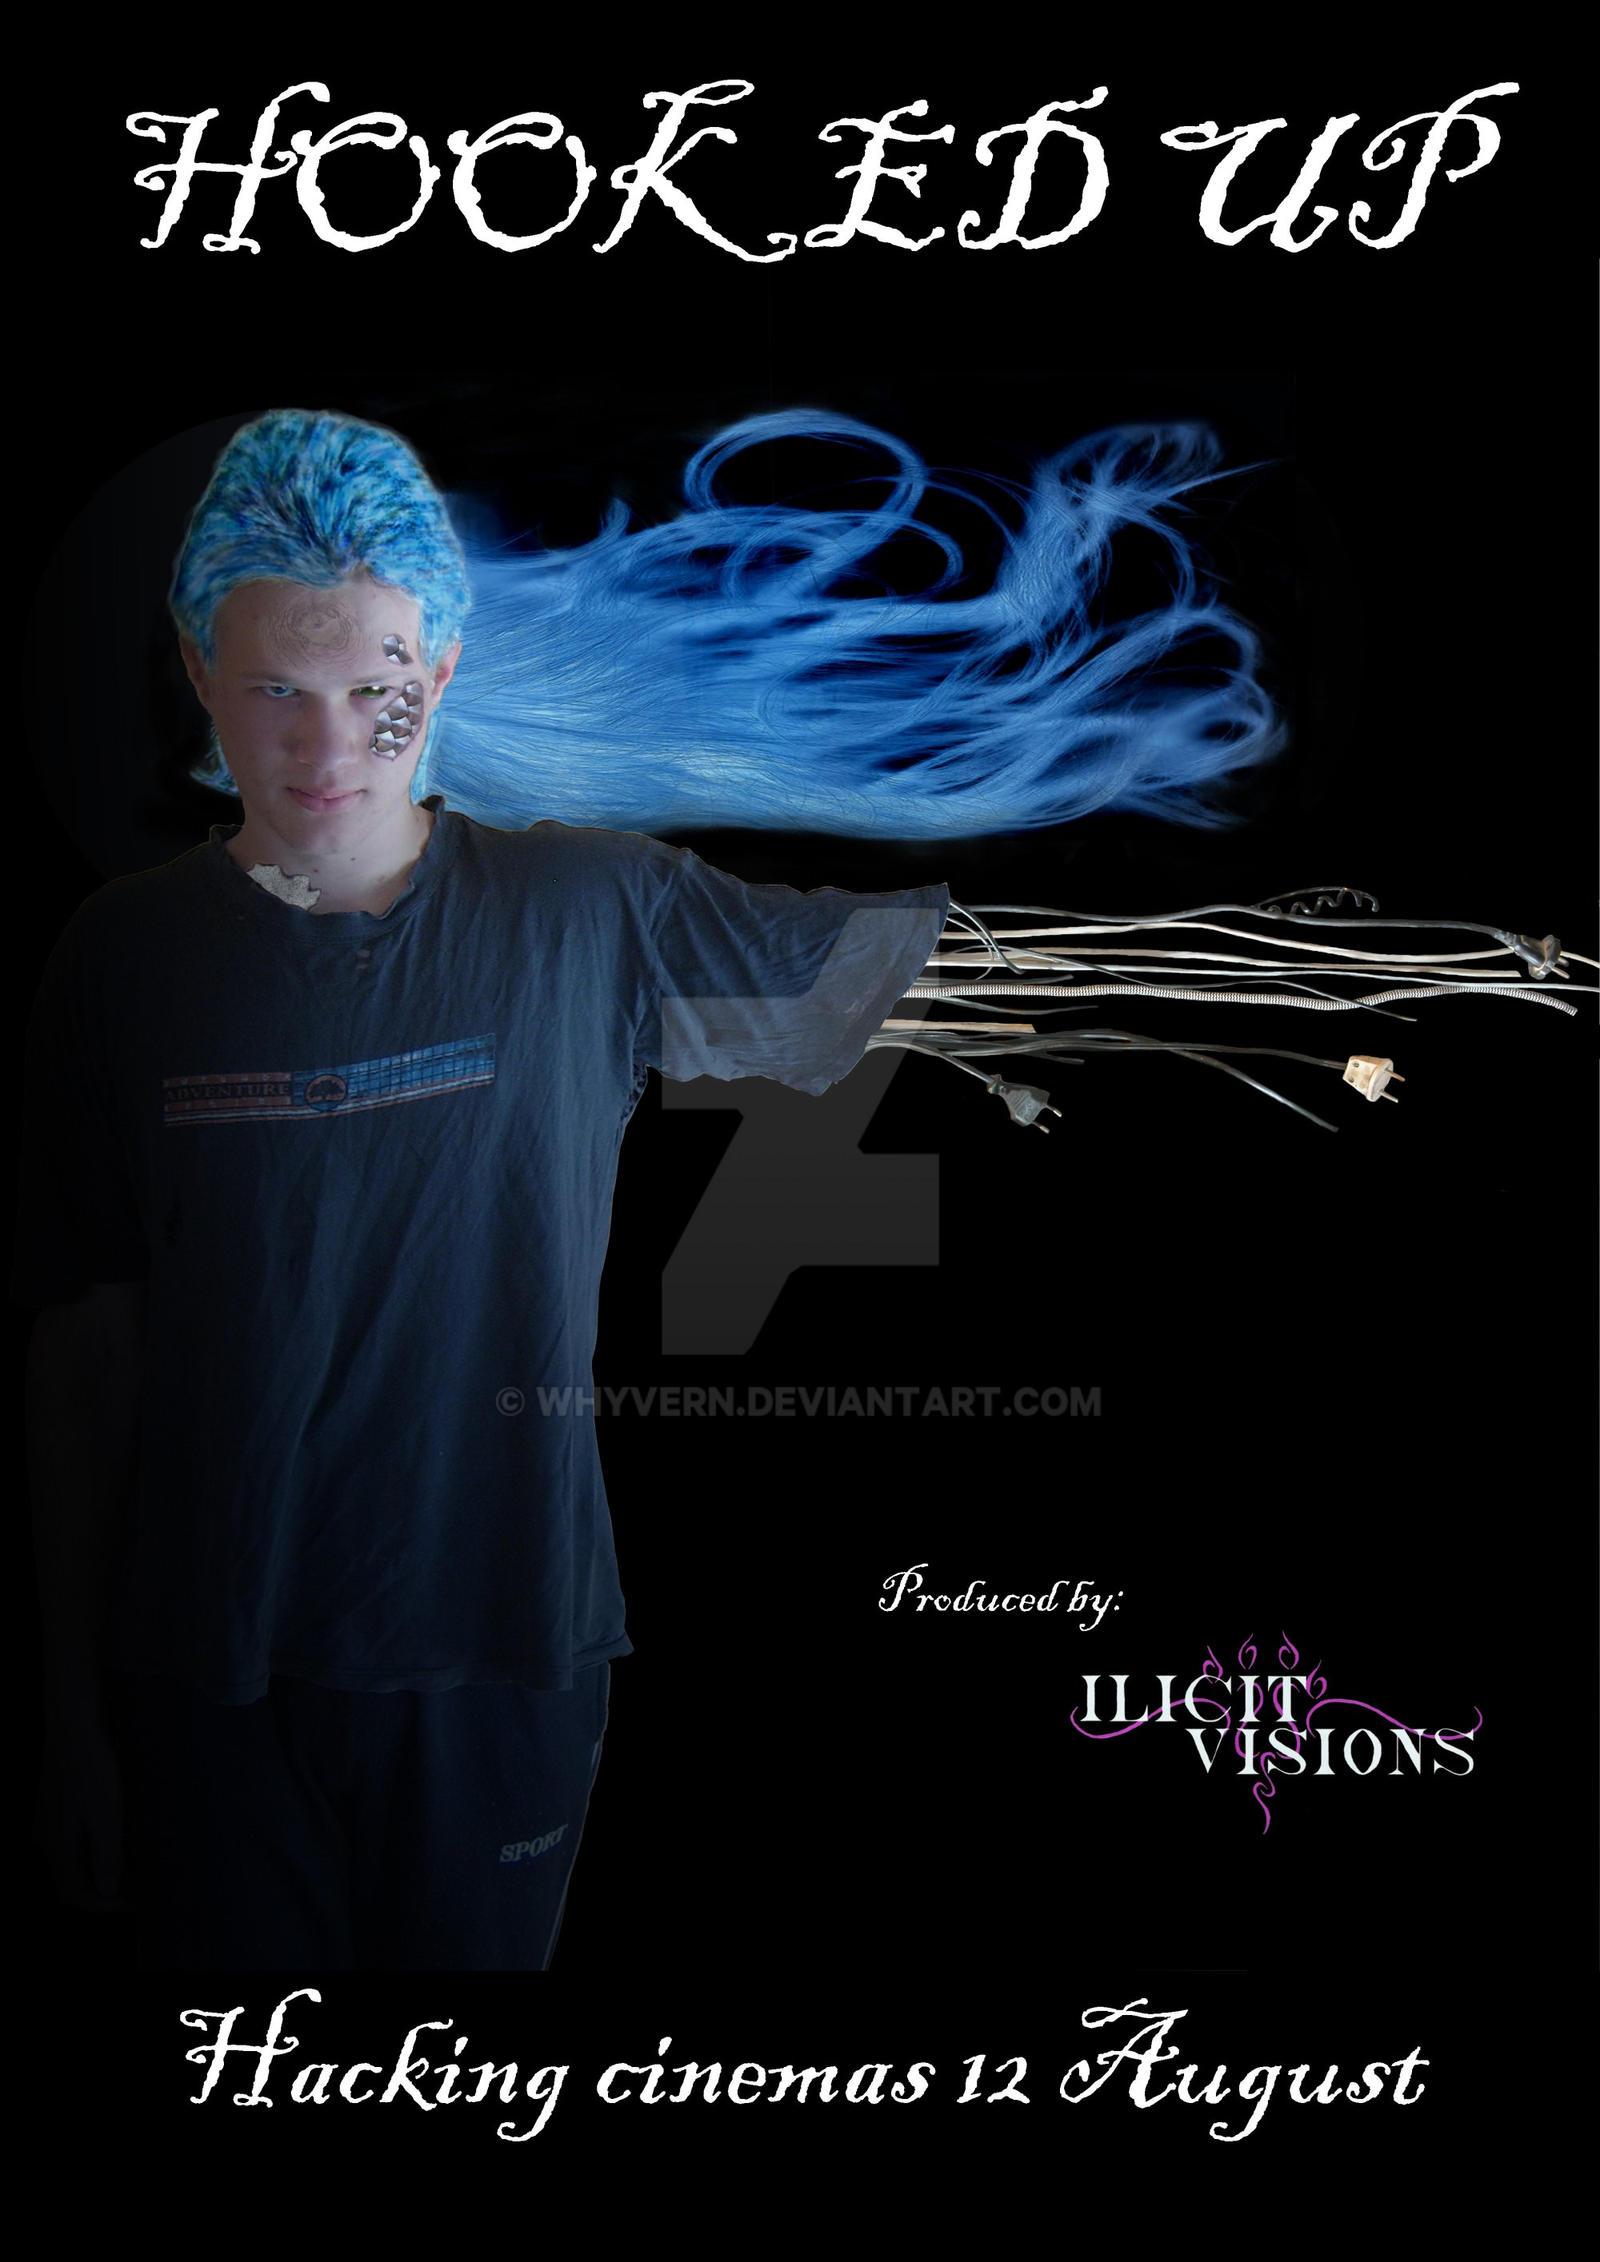 cyborg movie poster by whyvern on deviantart